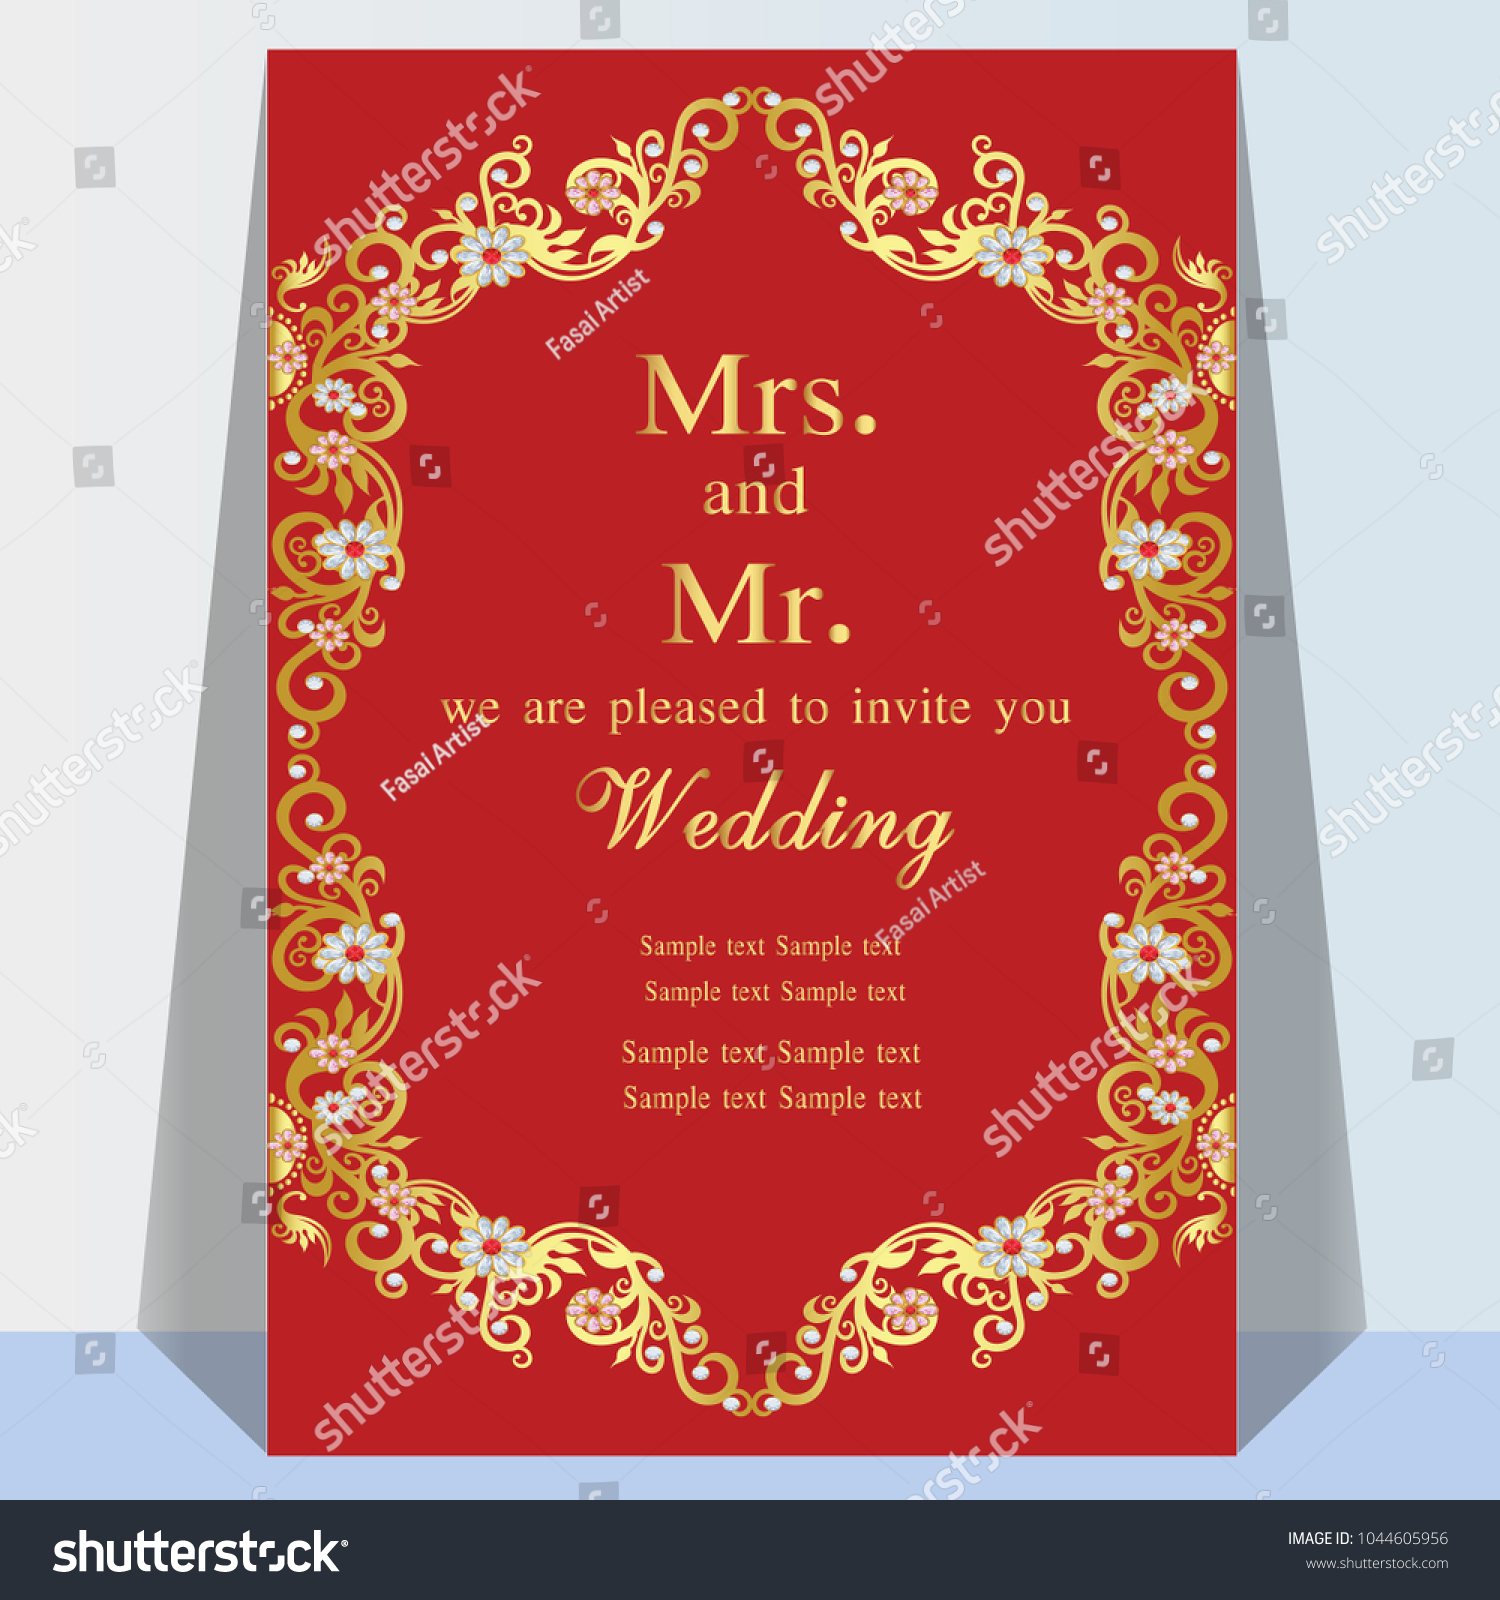 Vintage Invitation Wedding Cards Template Frame Stock Vector ...